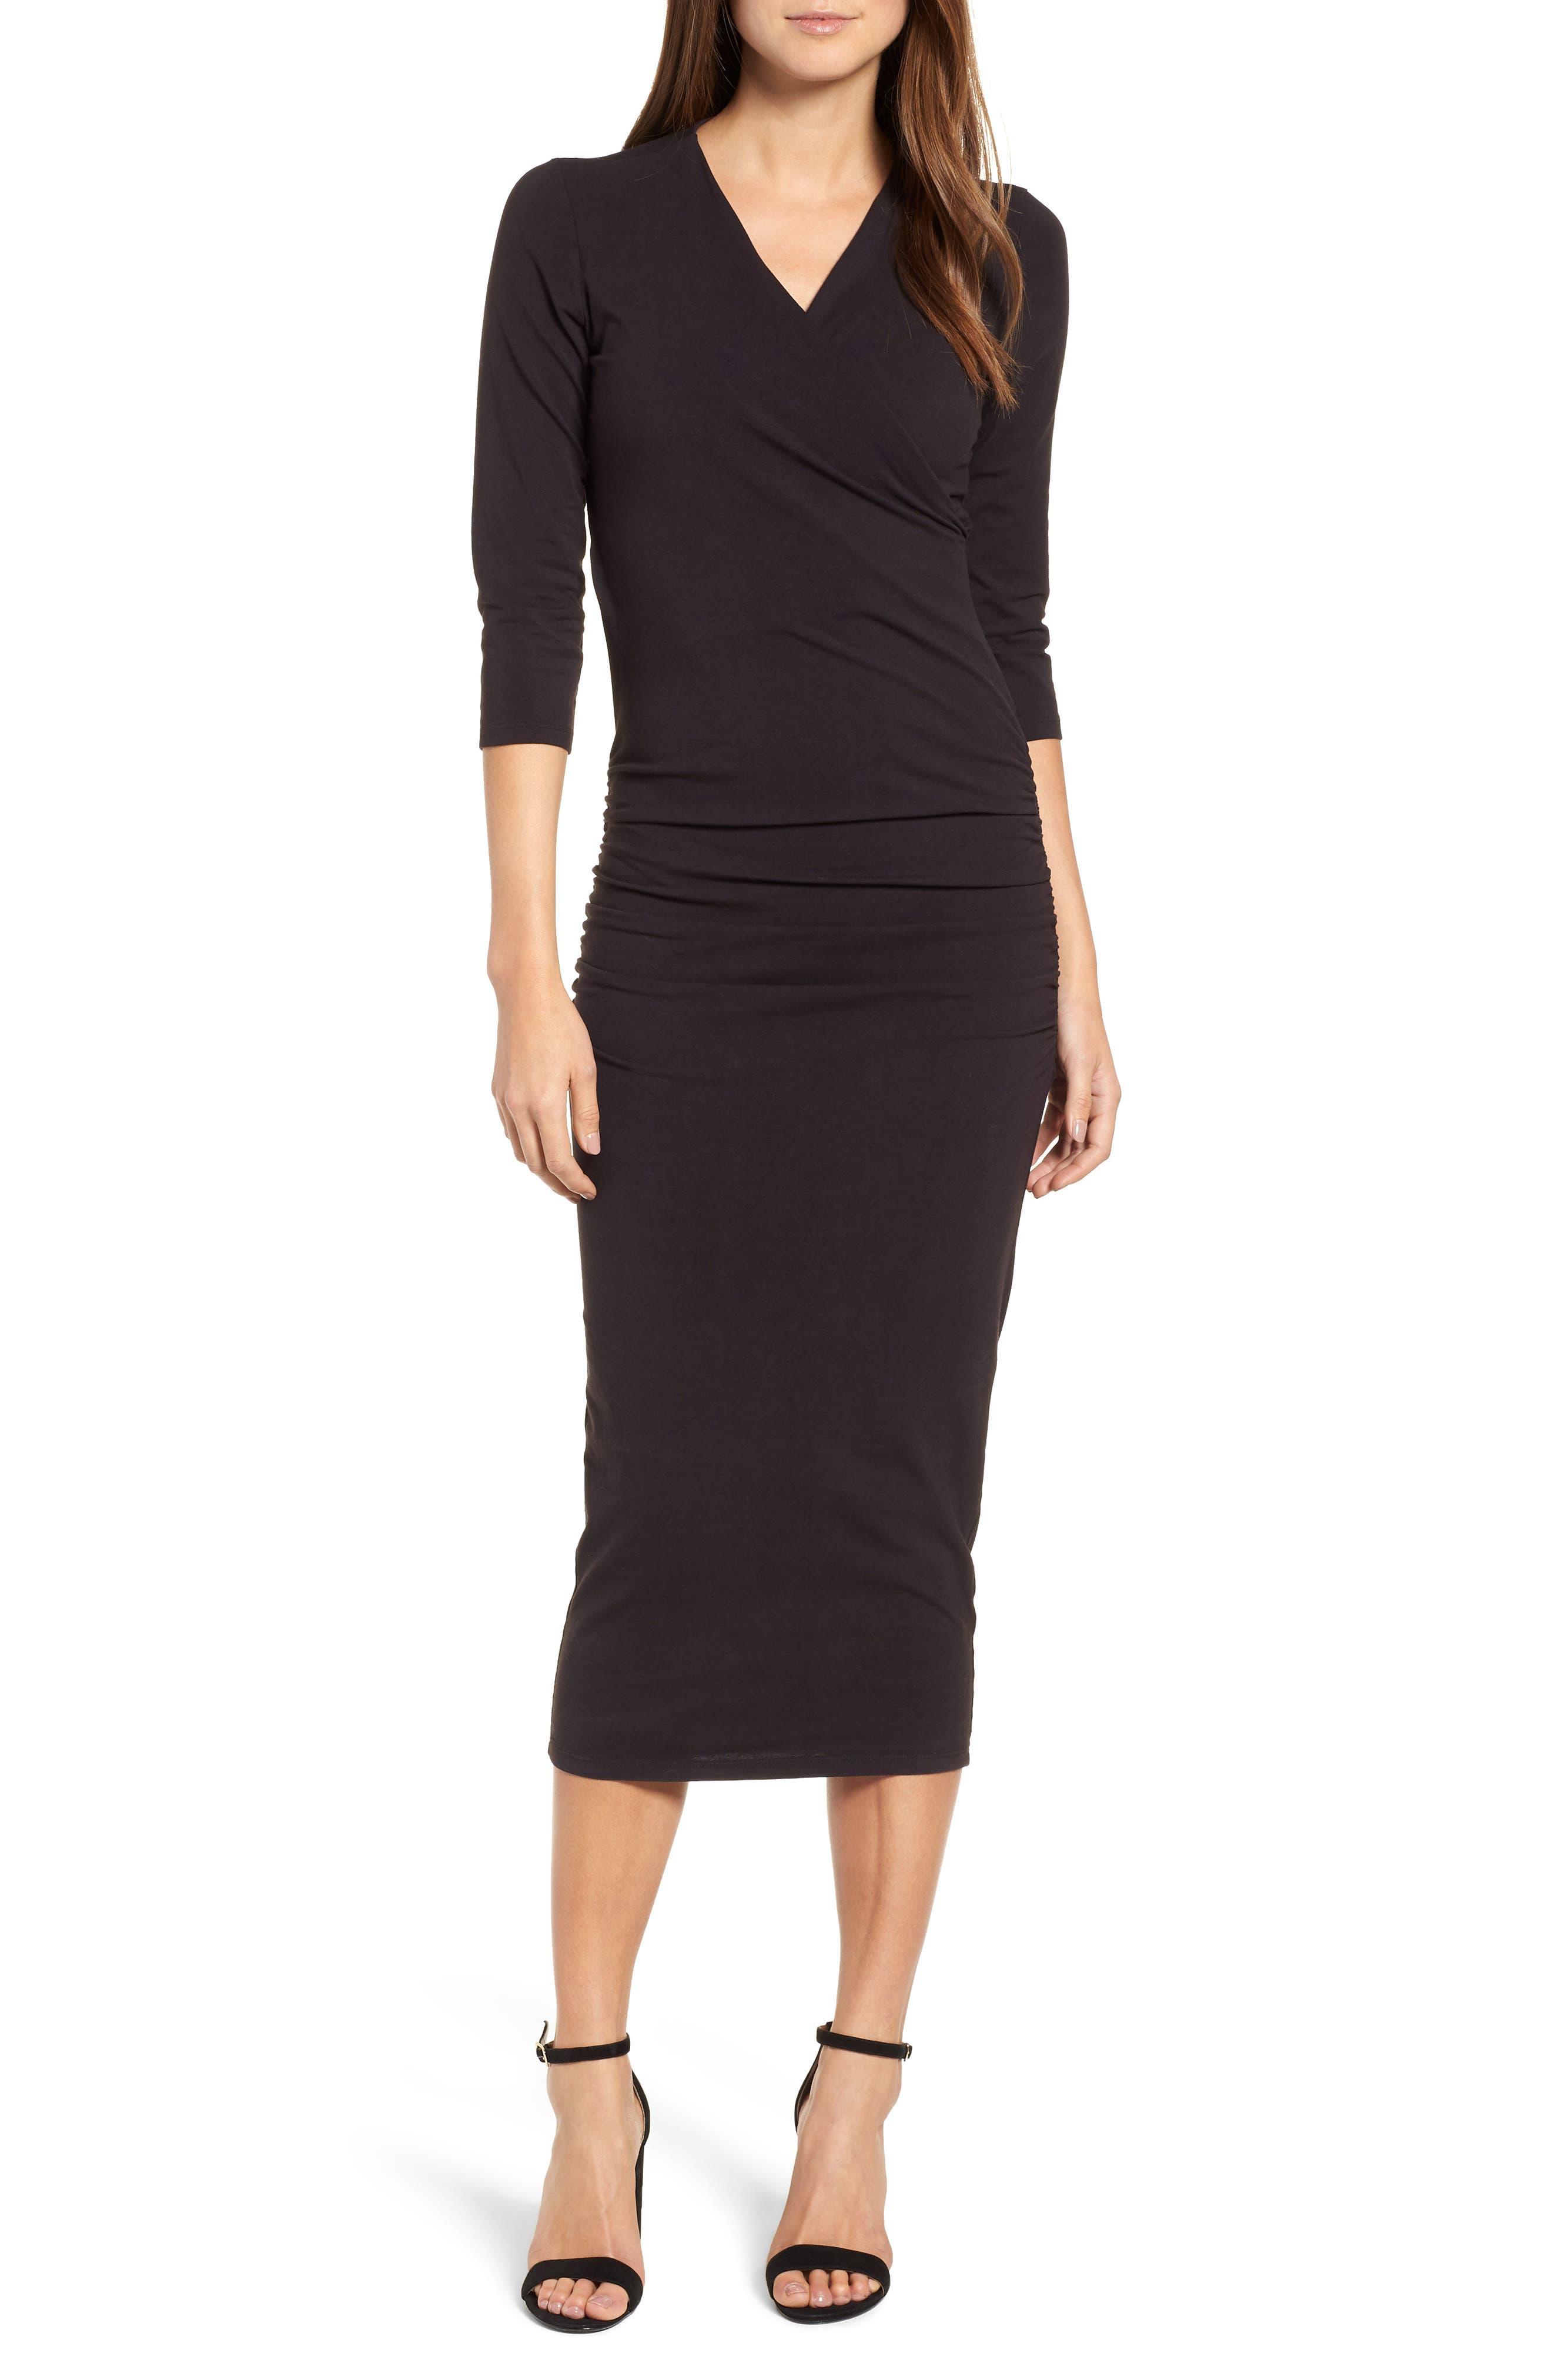 MICHAEL STARS,                             Ruched Surplice Stretch Cotton Body-Con Dress,                             Main thumbnail 1, color,                             001